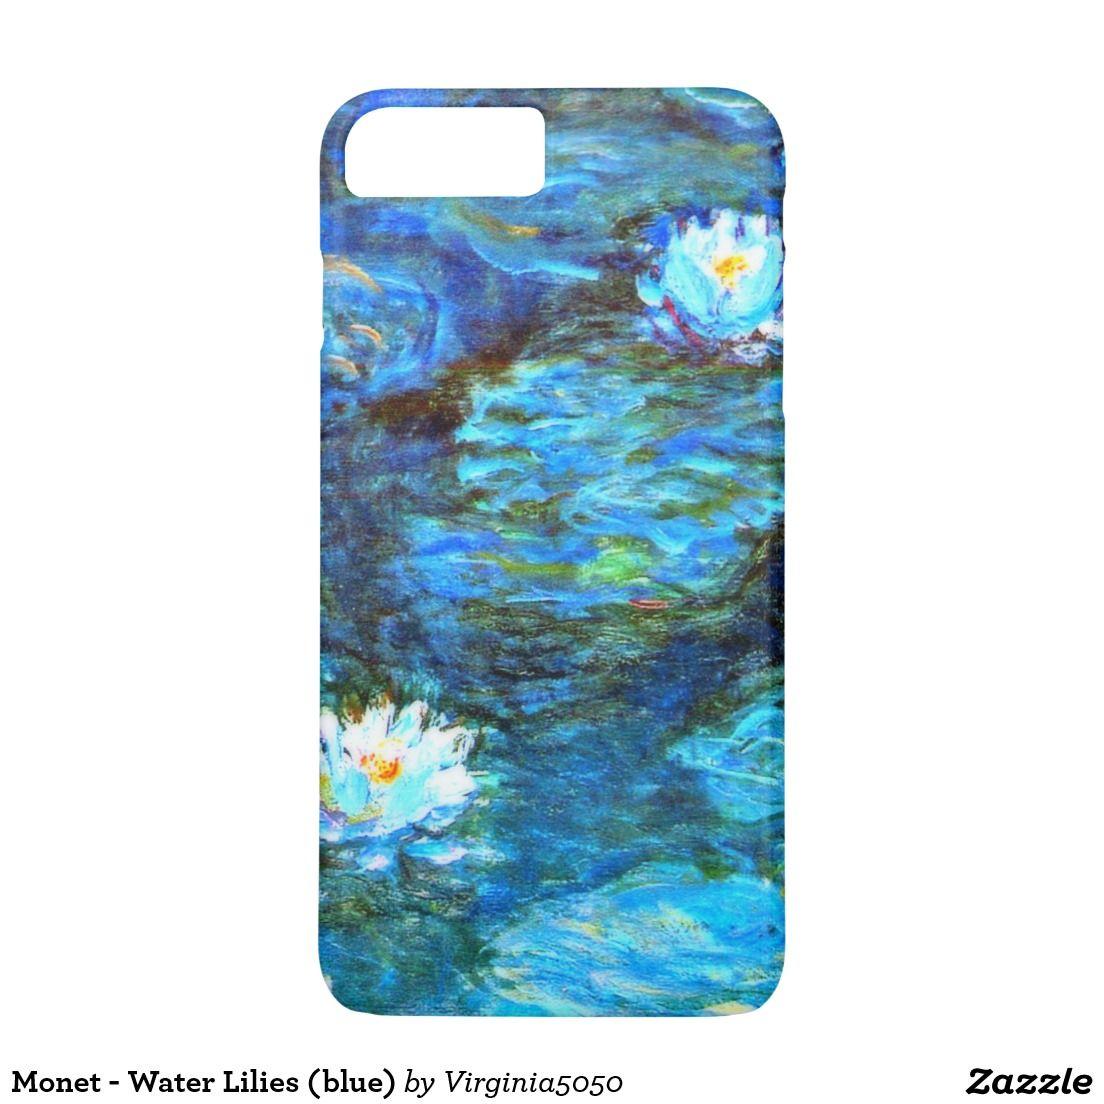 new arrival 7433e 2f193 Monet - Water Lilies (blue) Case-Mate iPhone Case | Zazzle.com ...